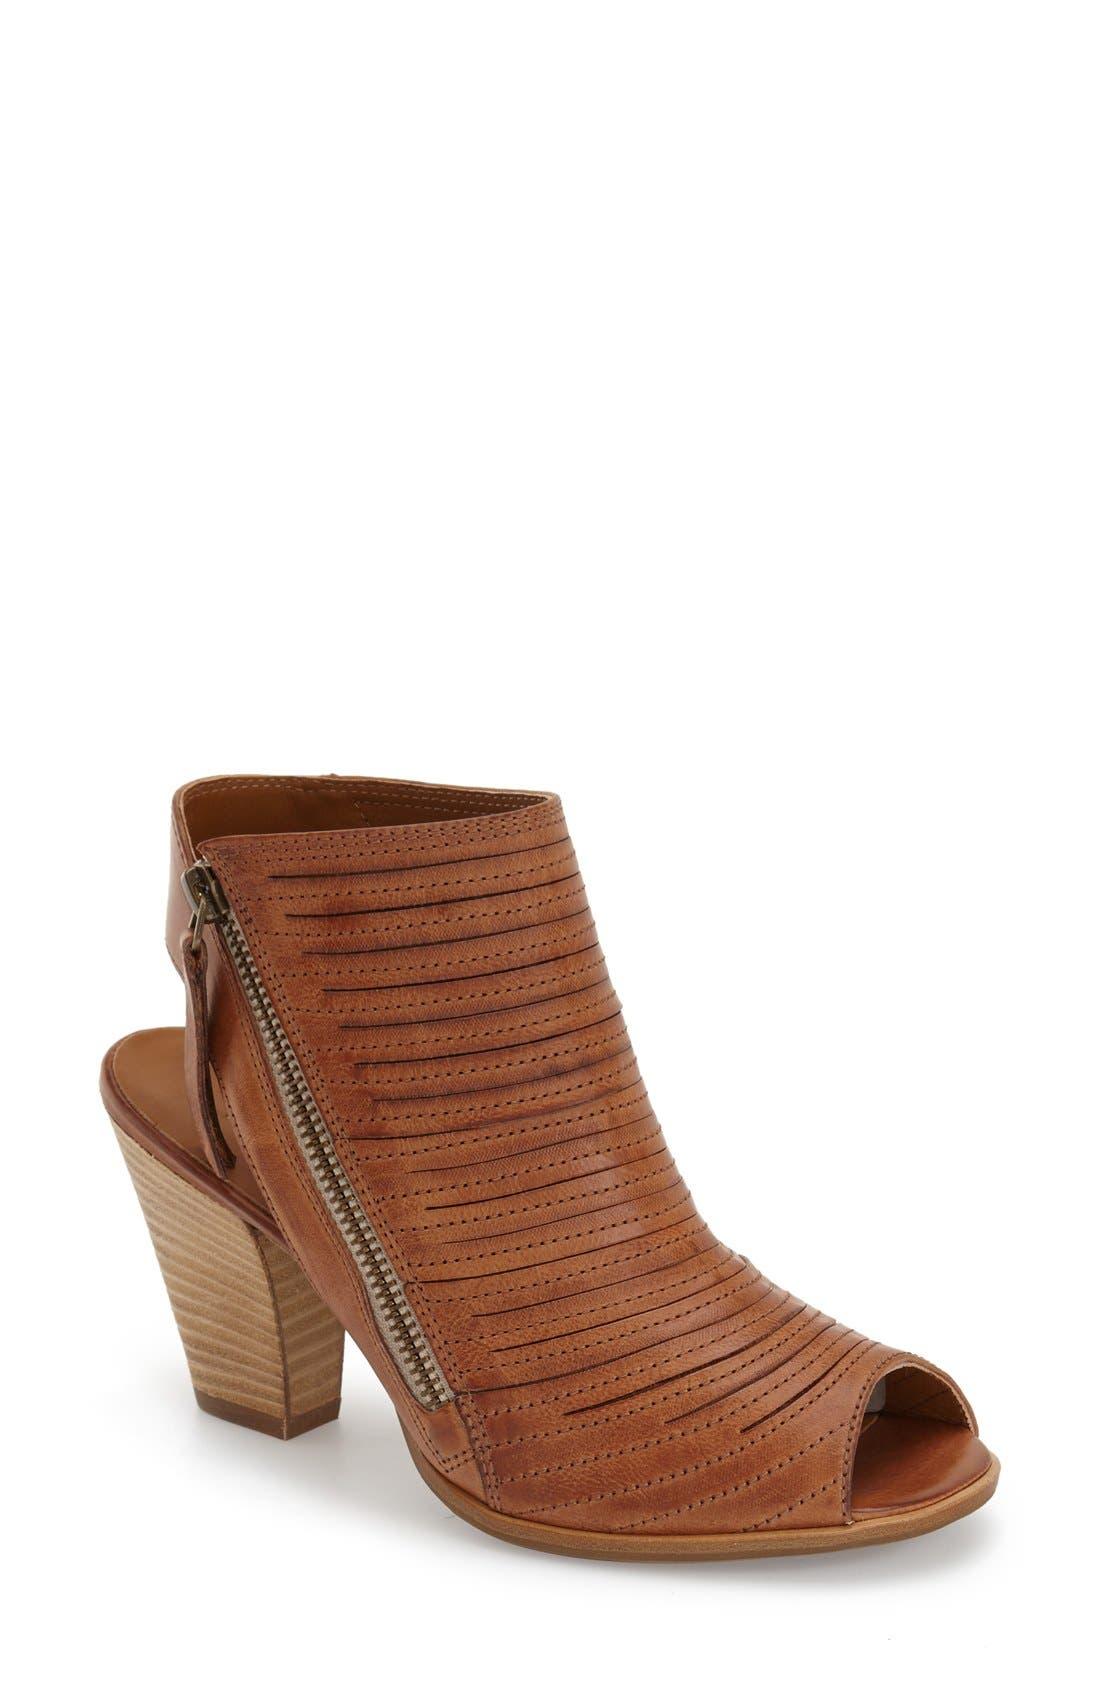 'Cayanne' Leather Peep Toe Sandal,                             Main thumbnail 4, color,